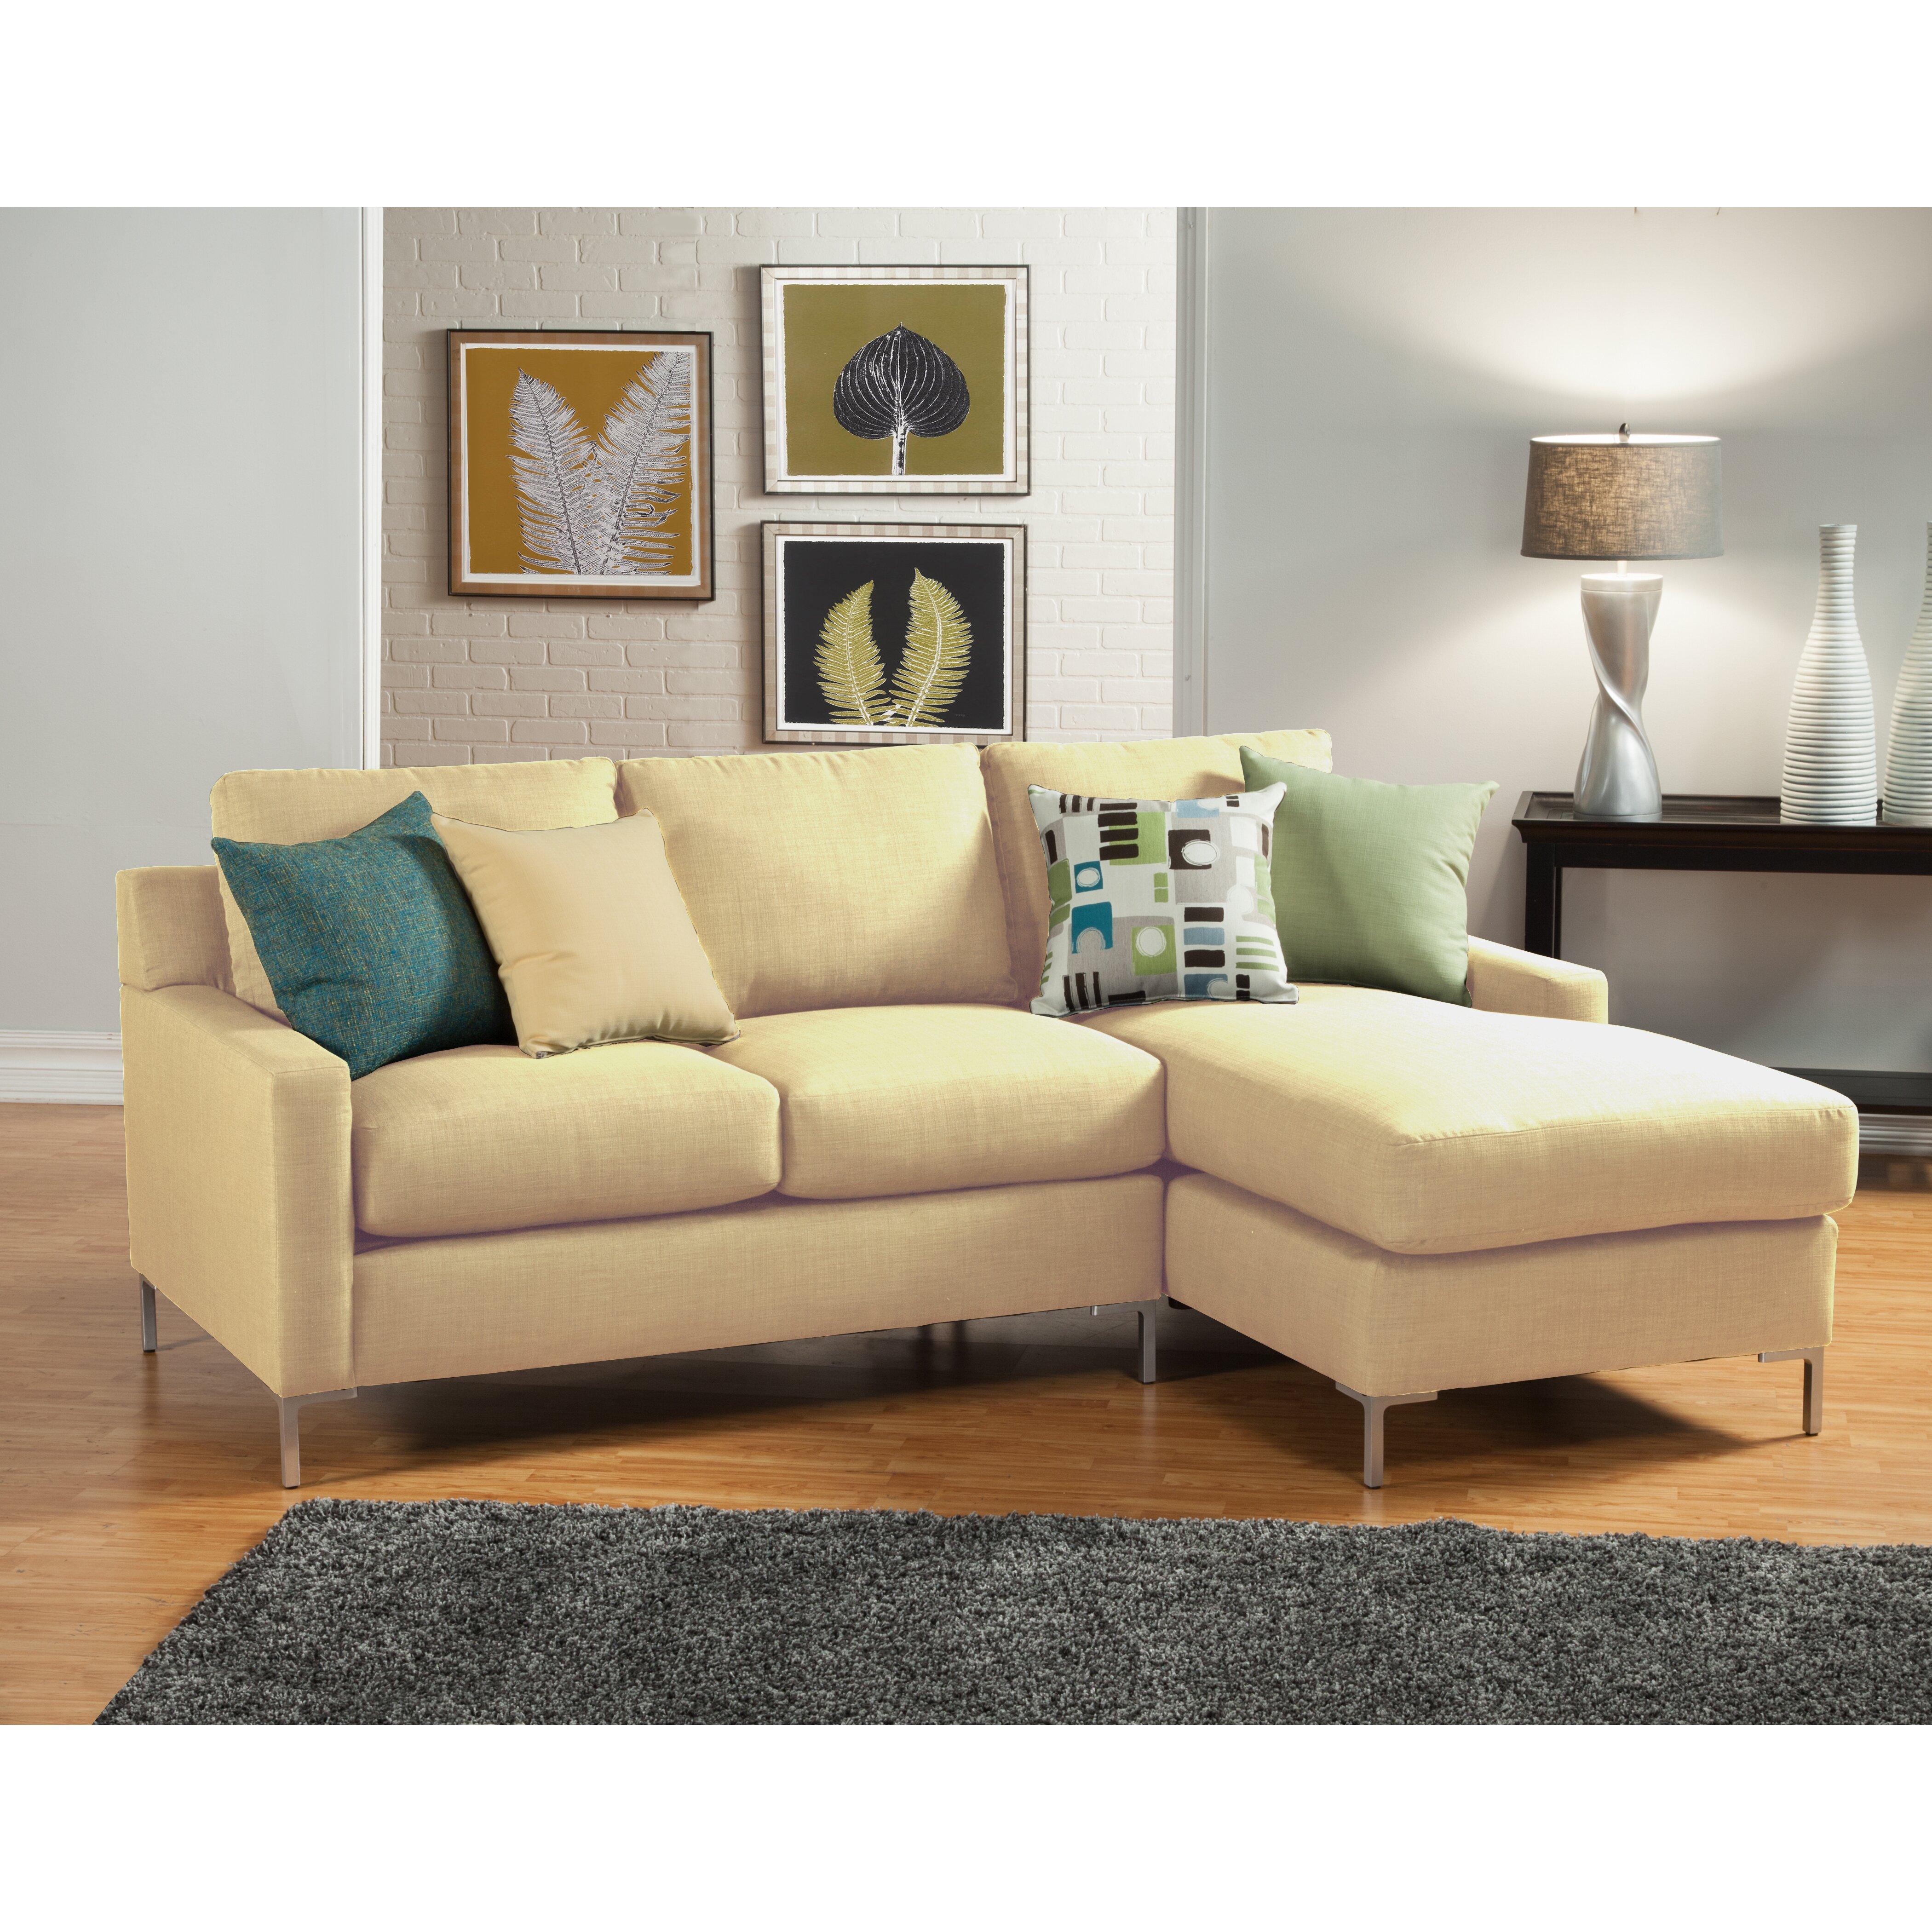 Hokku Designs Albany Sectional & Reviews | Wayfair